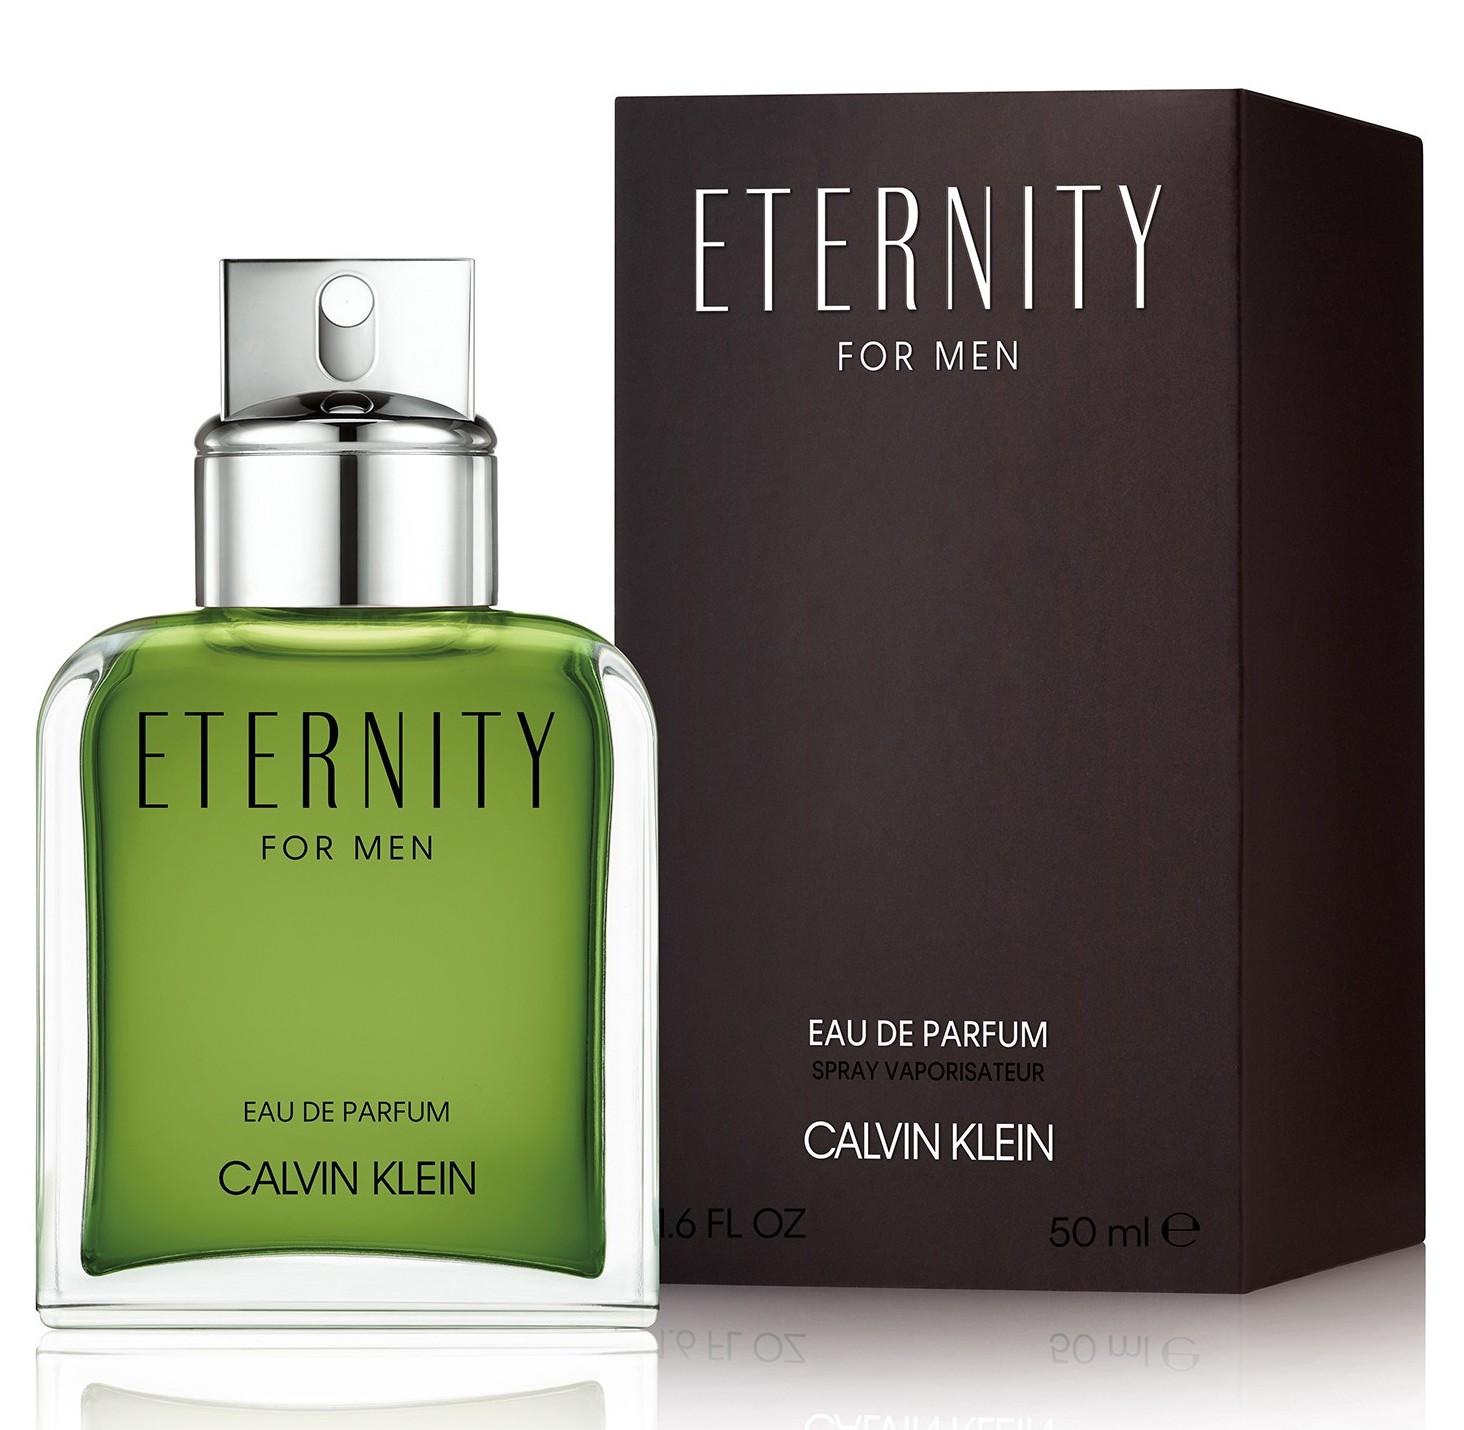 CALVIN KLEIN Вода парфюмерная мужская Calvin Klein Eternity For Men Edp 50 мл фото